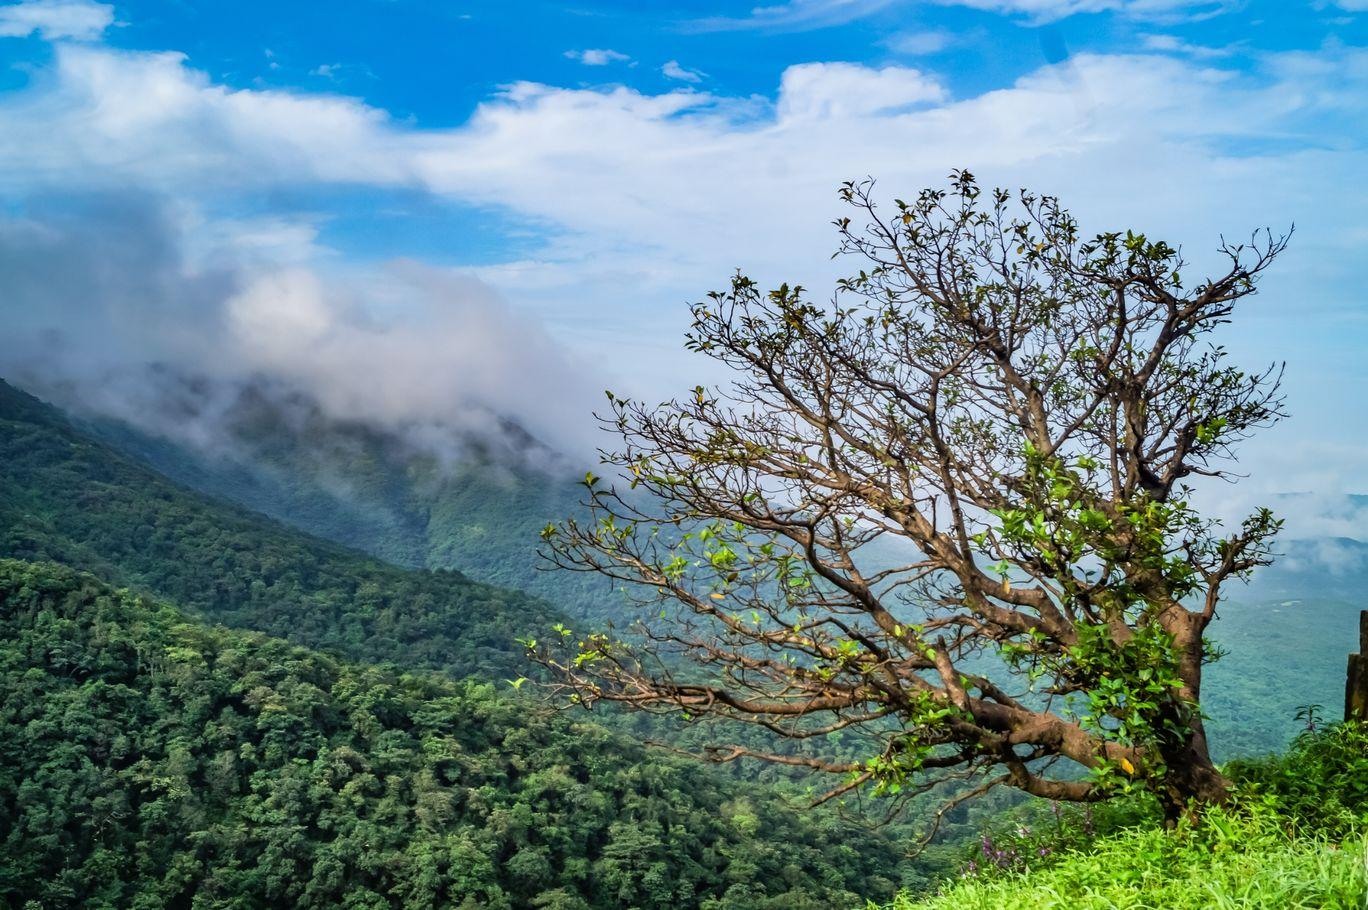 Photo of Amba Ghat By Swapnil Suvarna